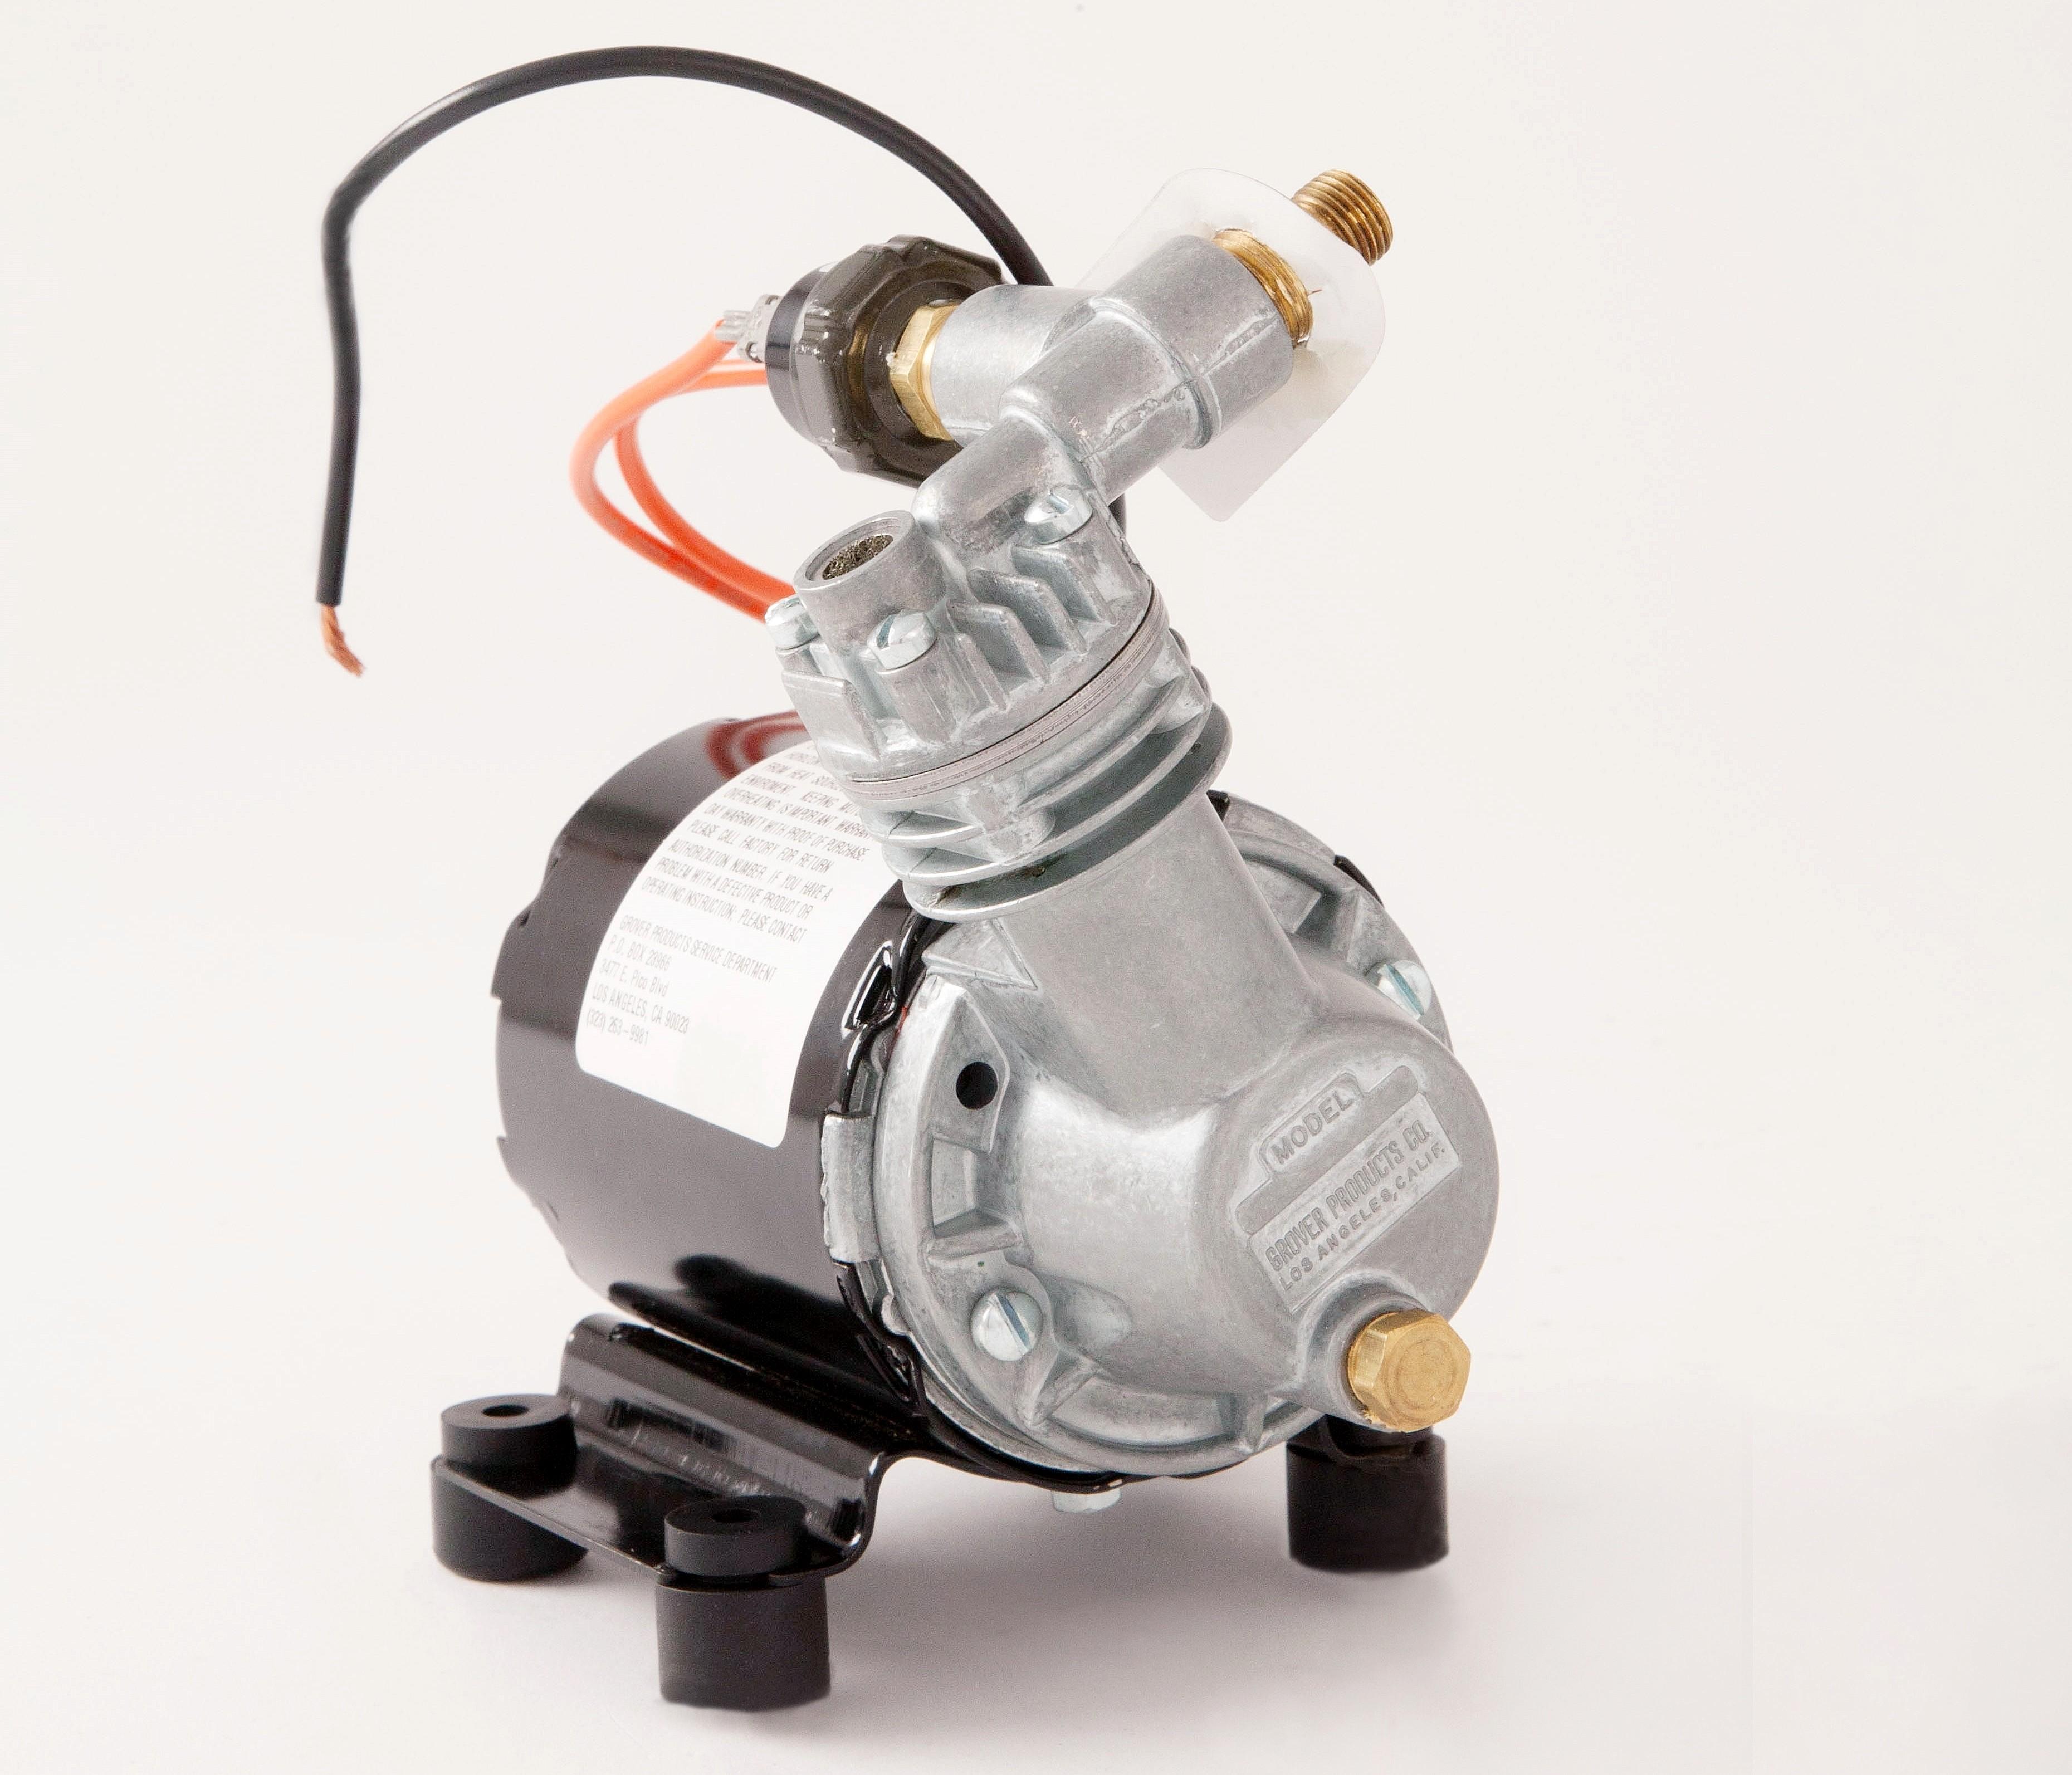 1167 Compressor 12V on 12v dc air conditioner, 12v motor, 12v air pump, gas compressor, 12v air conditioners for vehicles, rubber hose for compressor, 12v air conditioning system, refrigerator compressor,